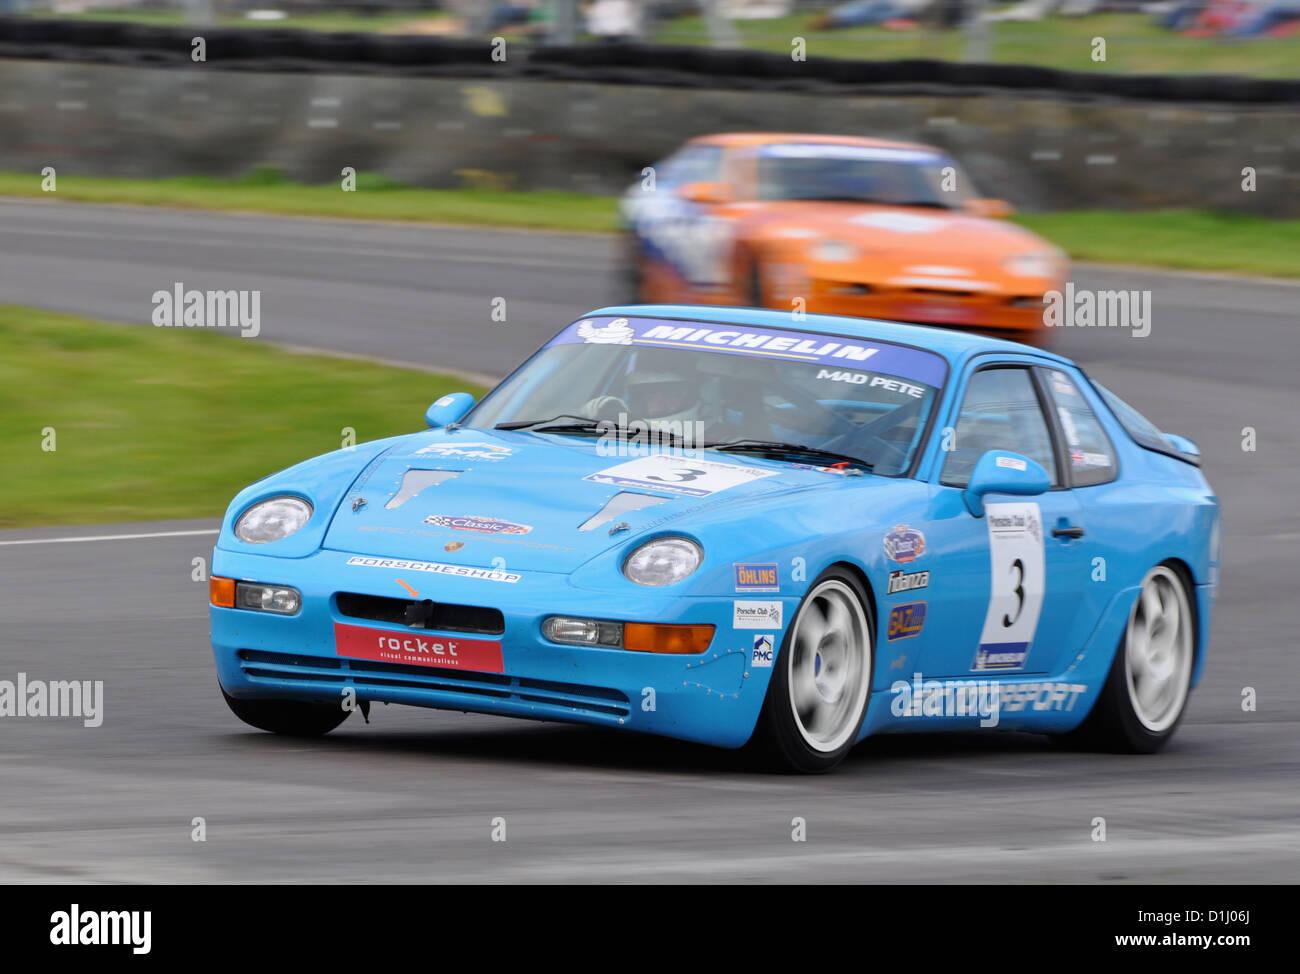 Porsche 928 at Castle Combe Circuit - Stock Image